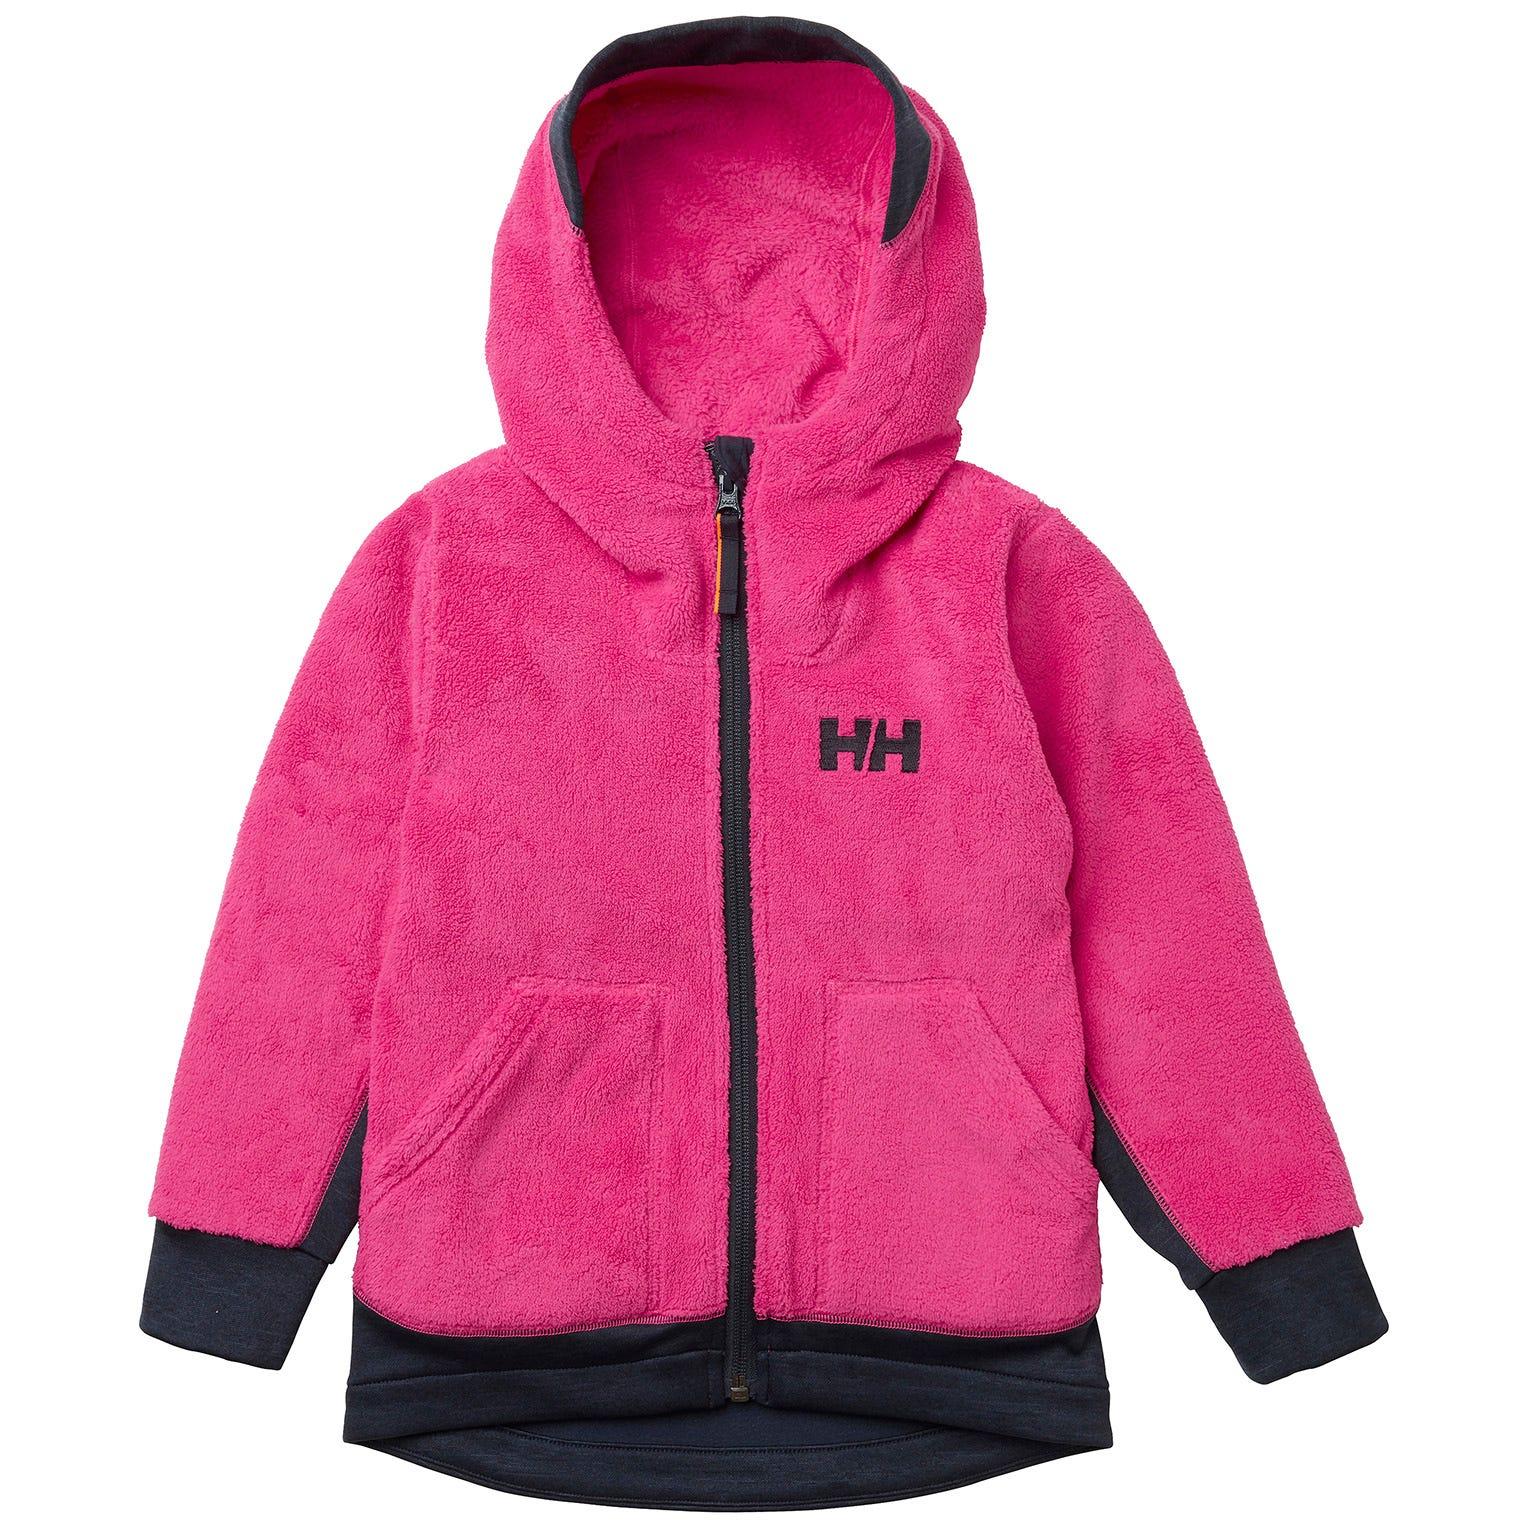 Helly Hansen Kids Chill Fz Hoodie Fleece Pink 104/4